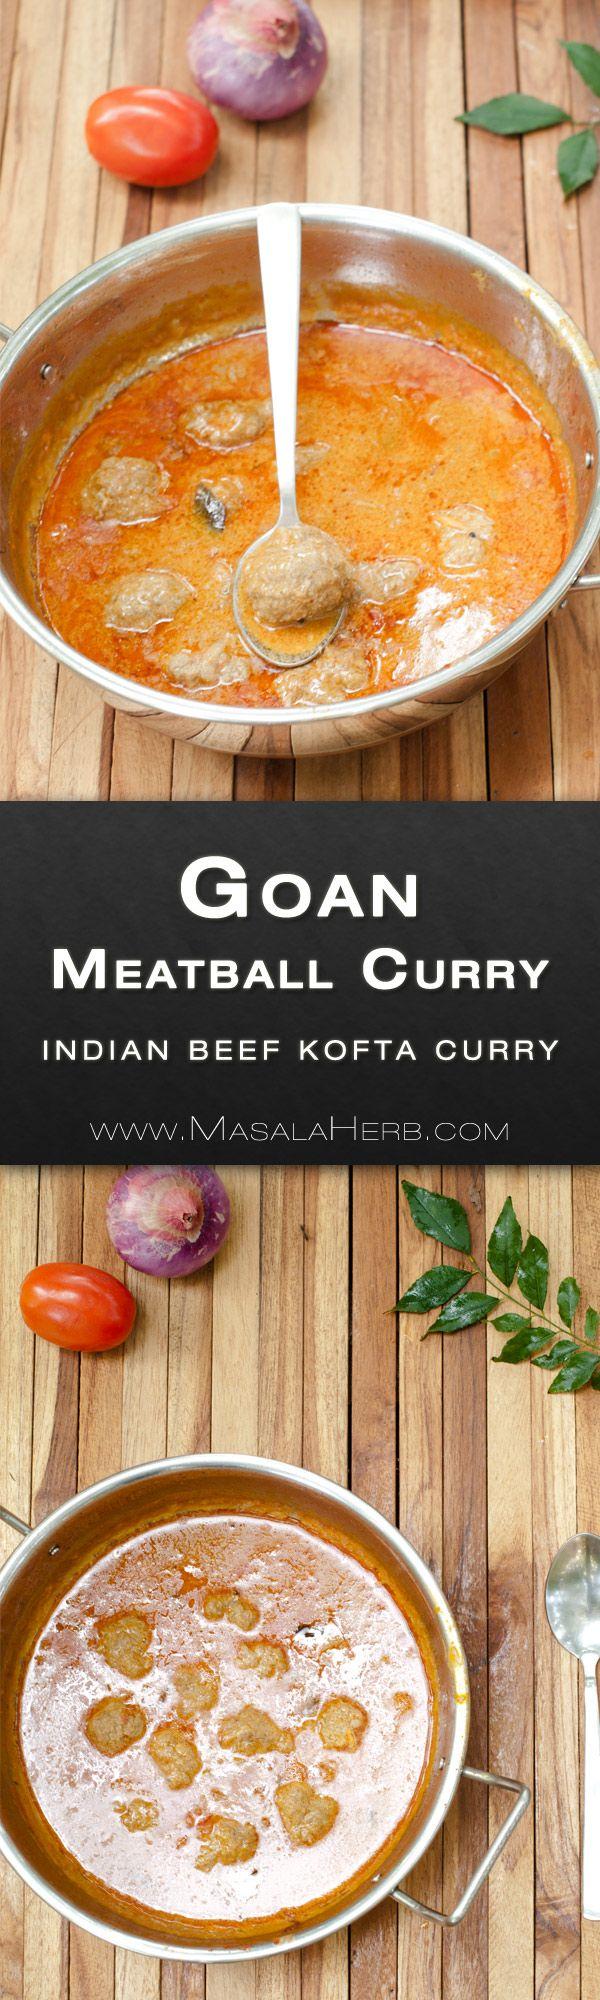 how to make beef kofta